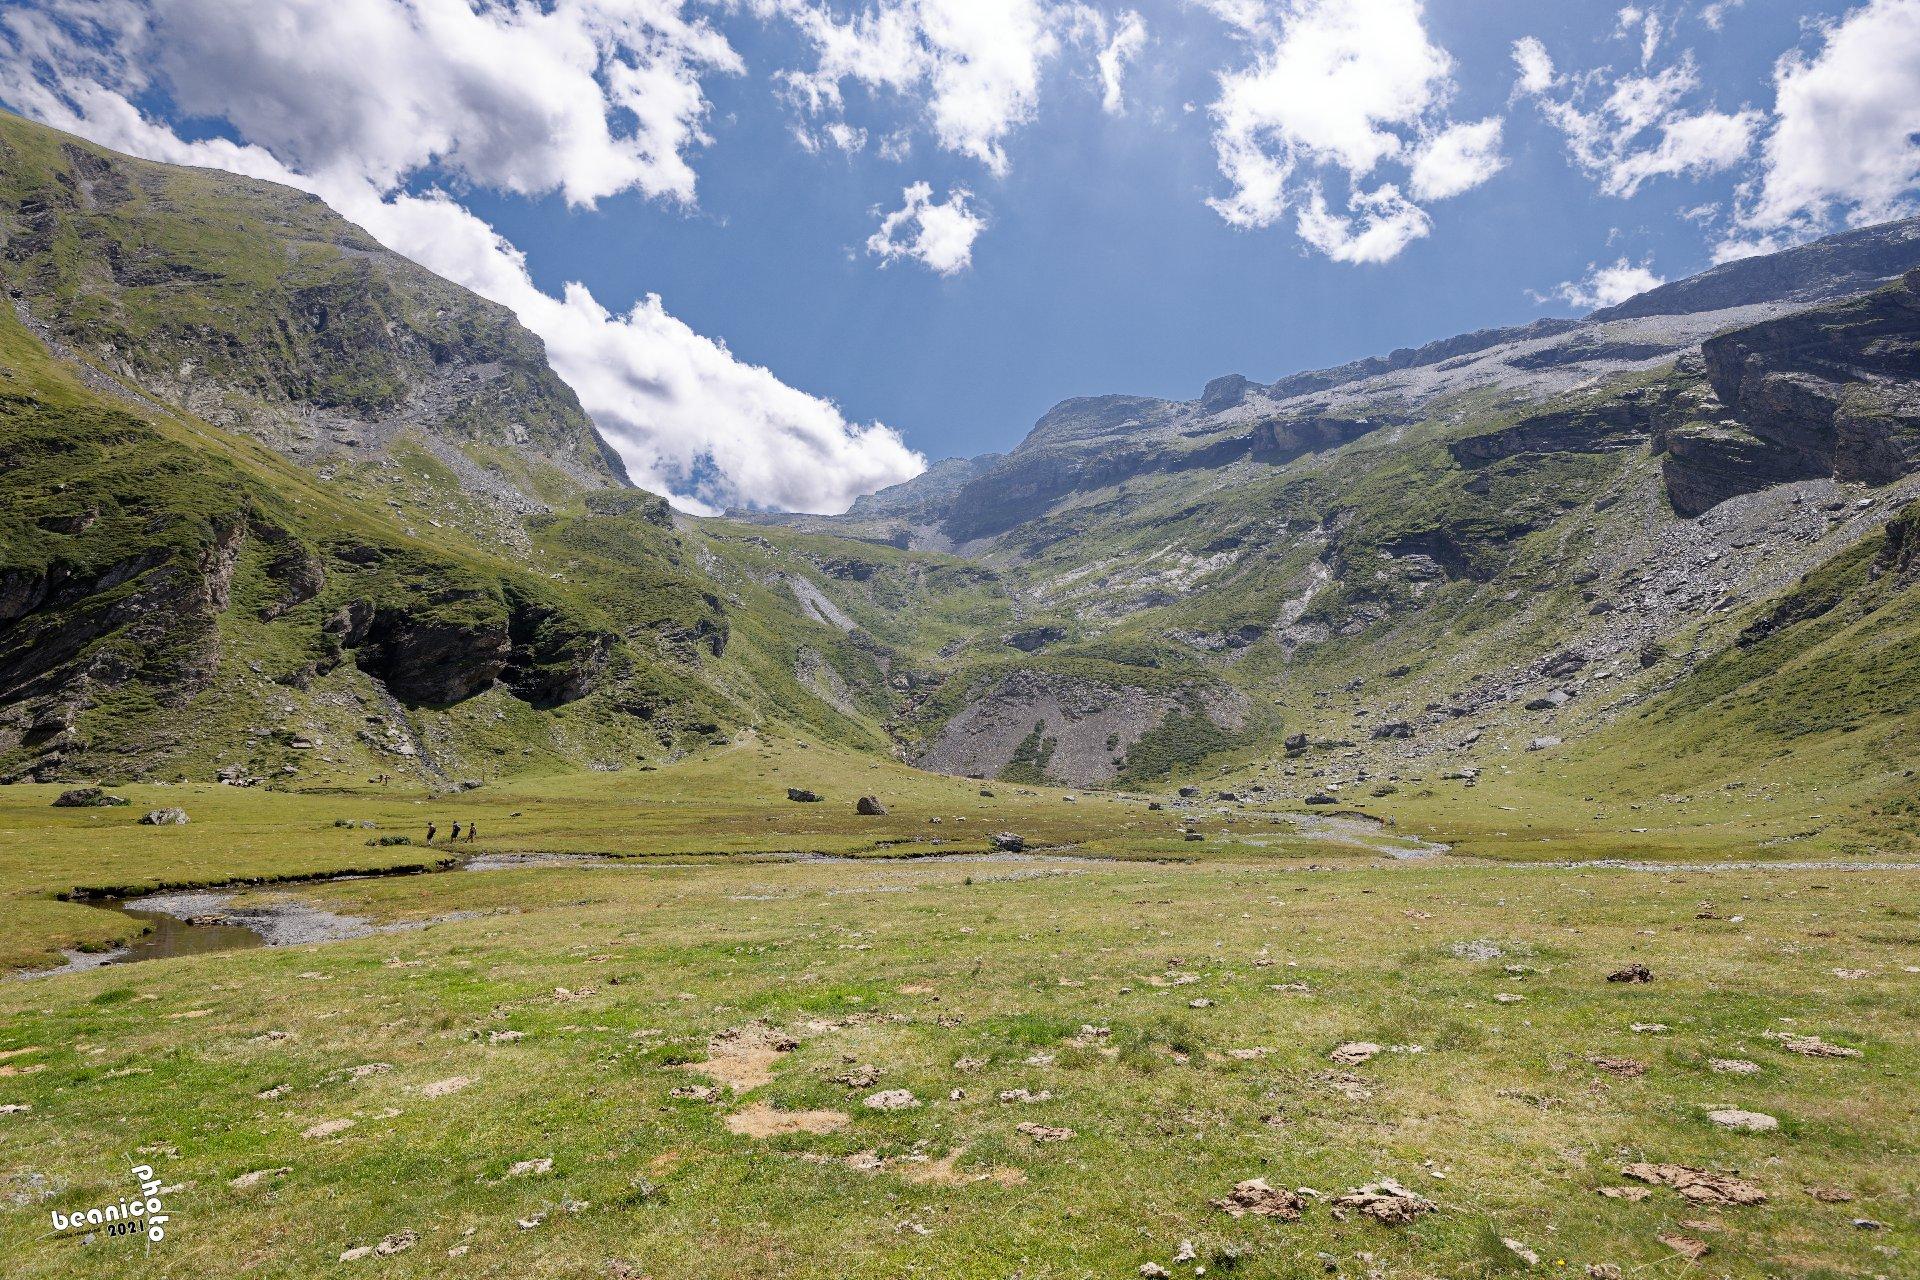 Hautes Pyrénées - Topo Rando 2 - Piau-Engaly - Lac de Badet